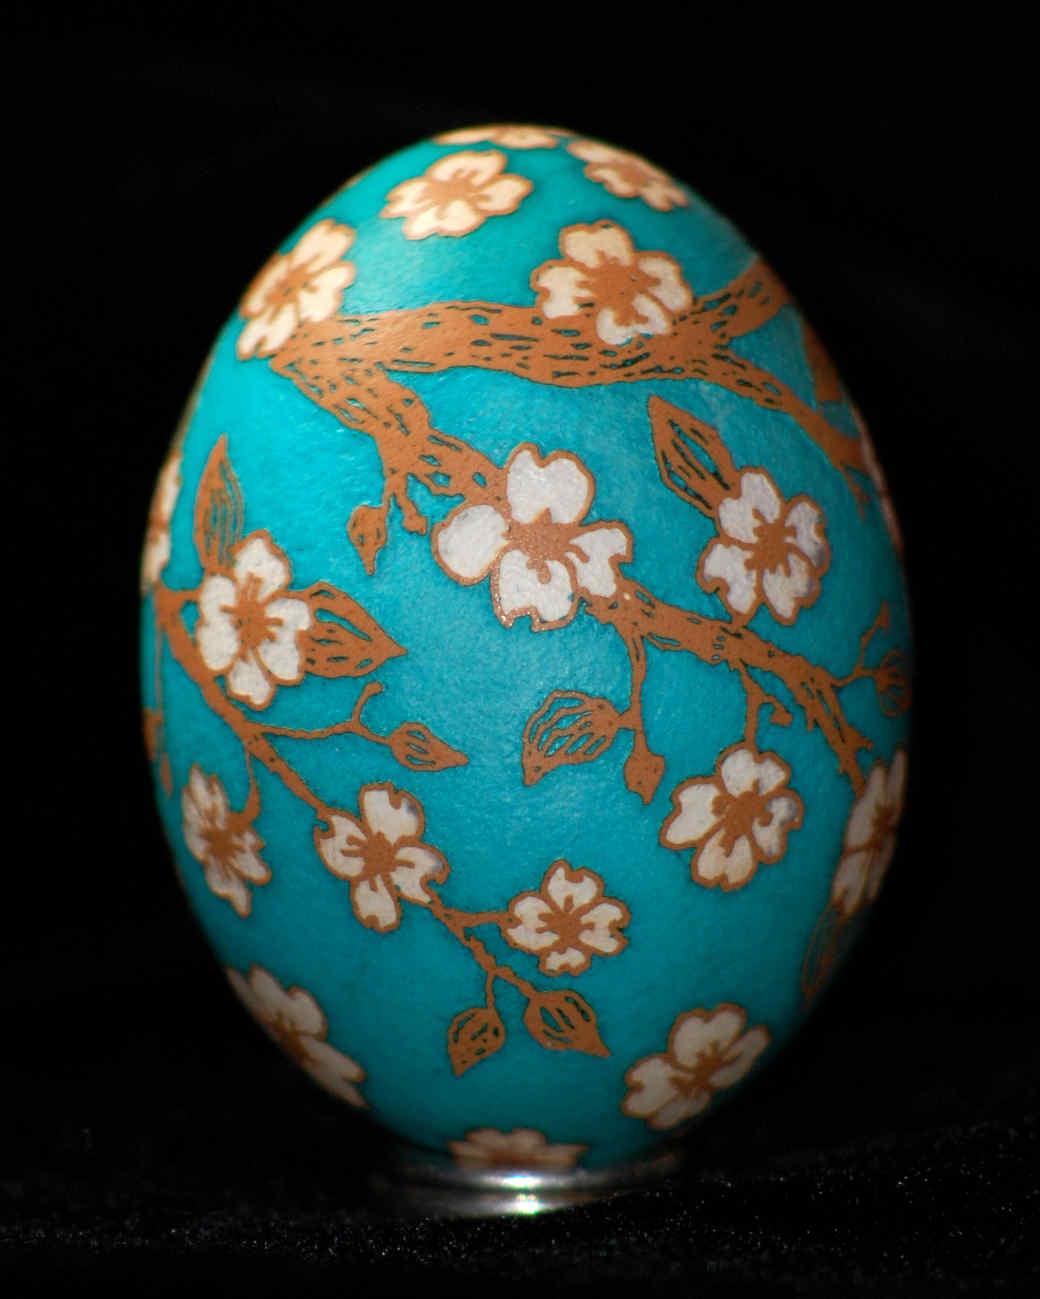 marthas-egg-hunt-johanna-james-heinz-0414.jpg